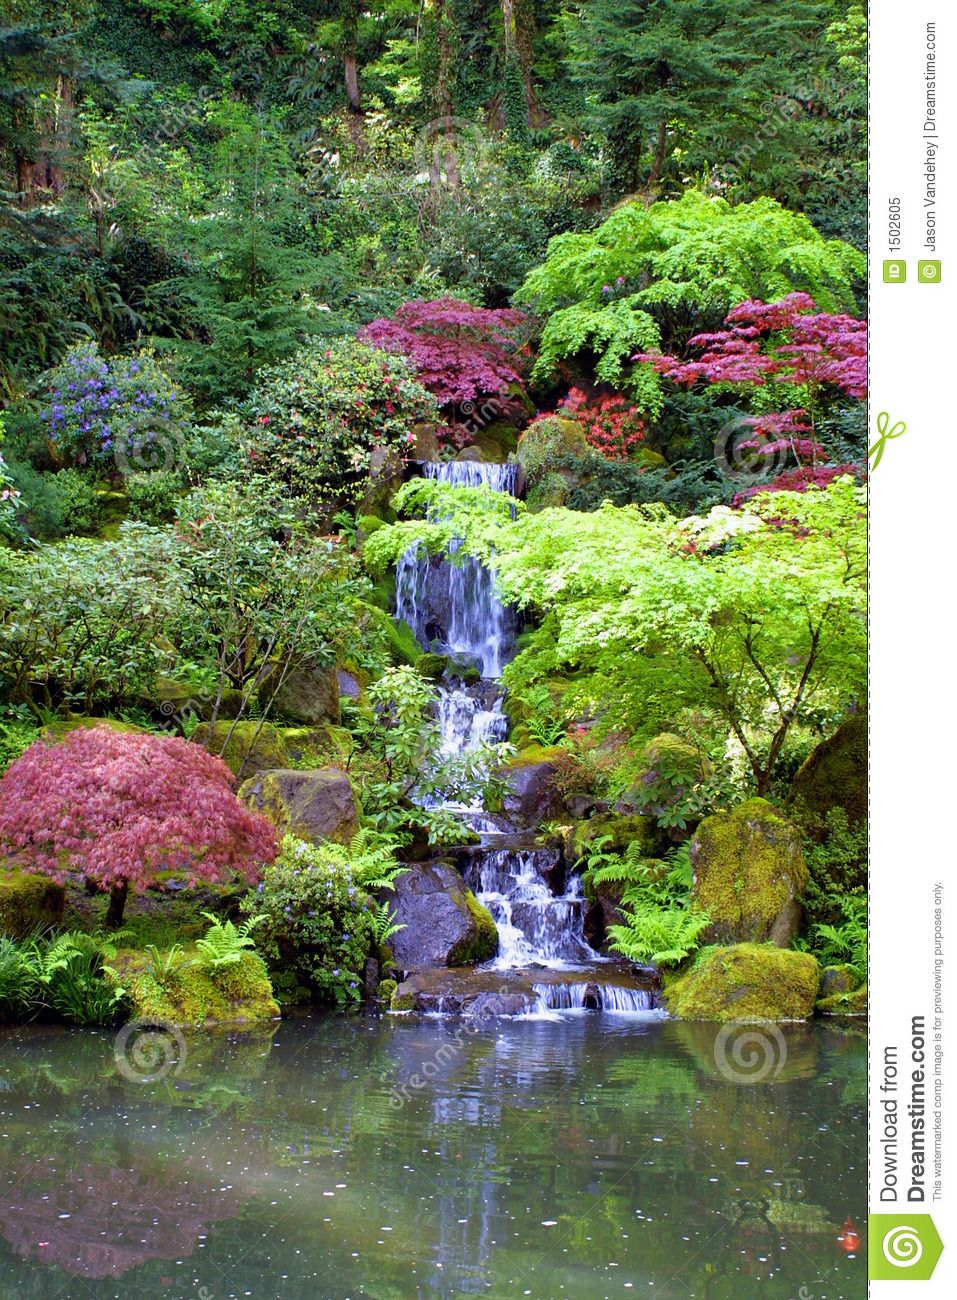 ba73b685f3c61fdd851153c2f548232c - Better Homes And Gardens Detroit Lakes